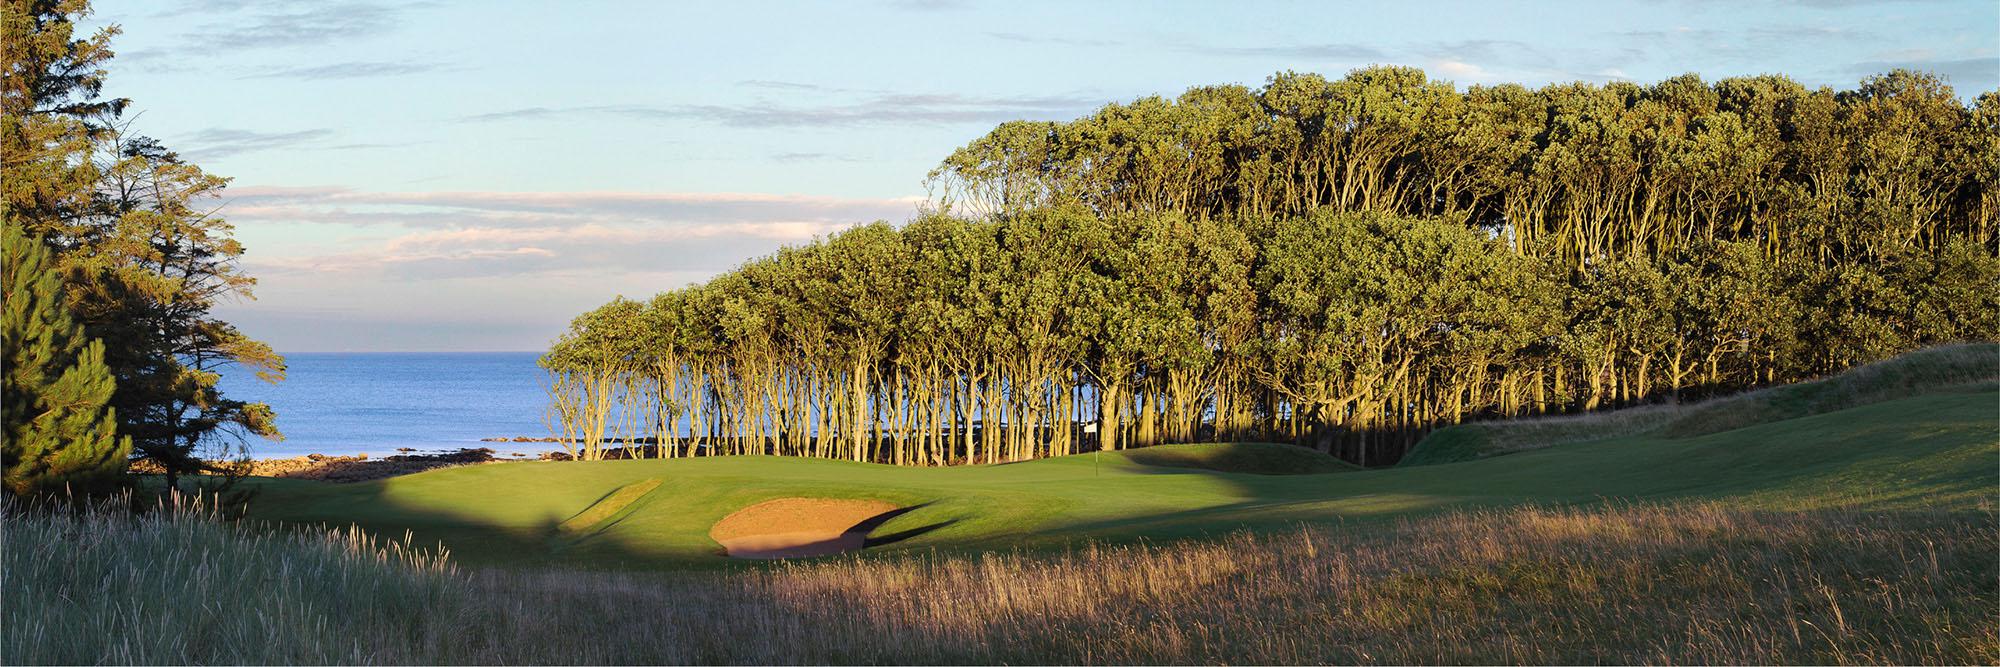 Golf Course Image - Kingsbarns No. 8